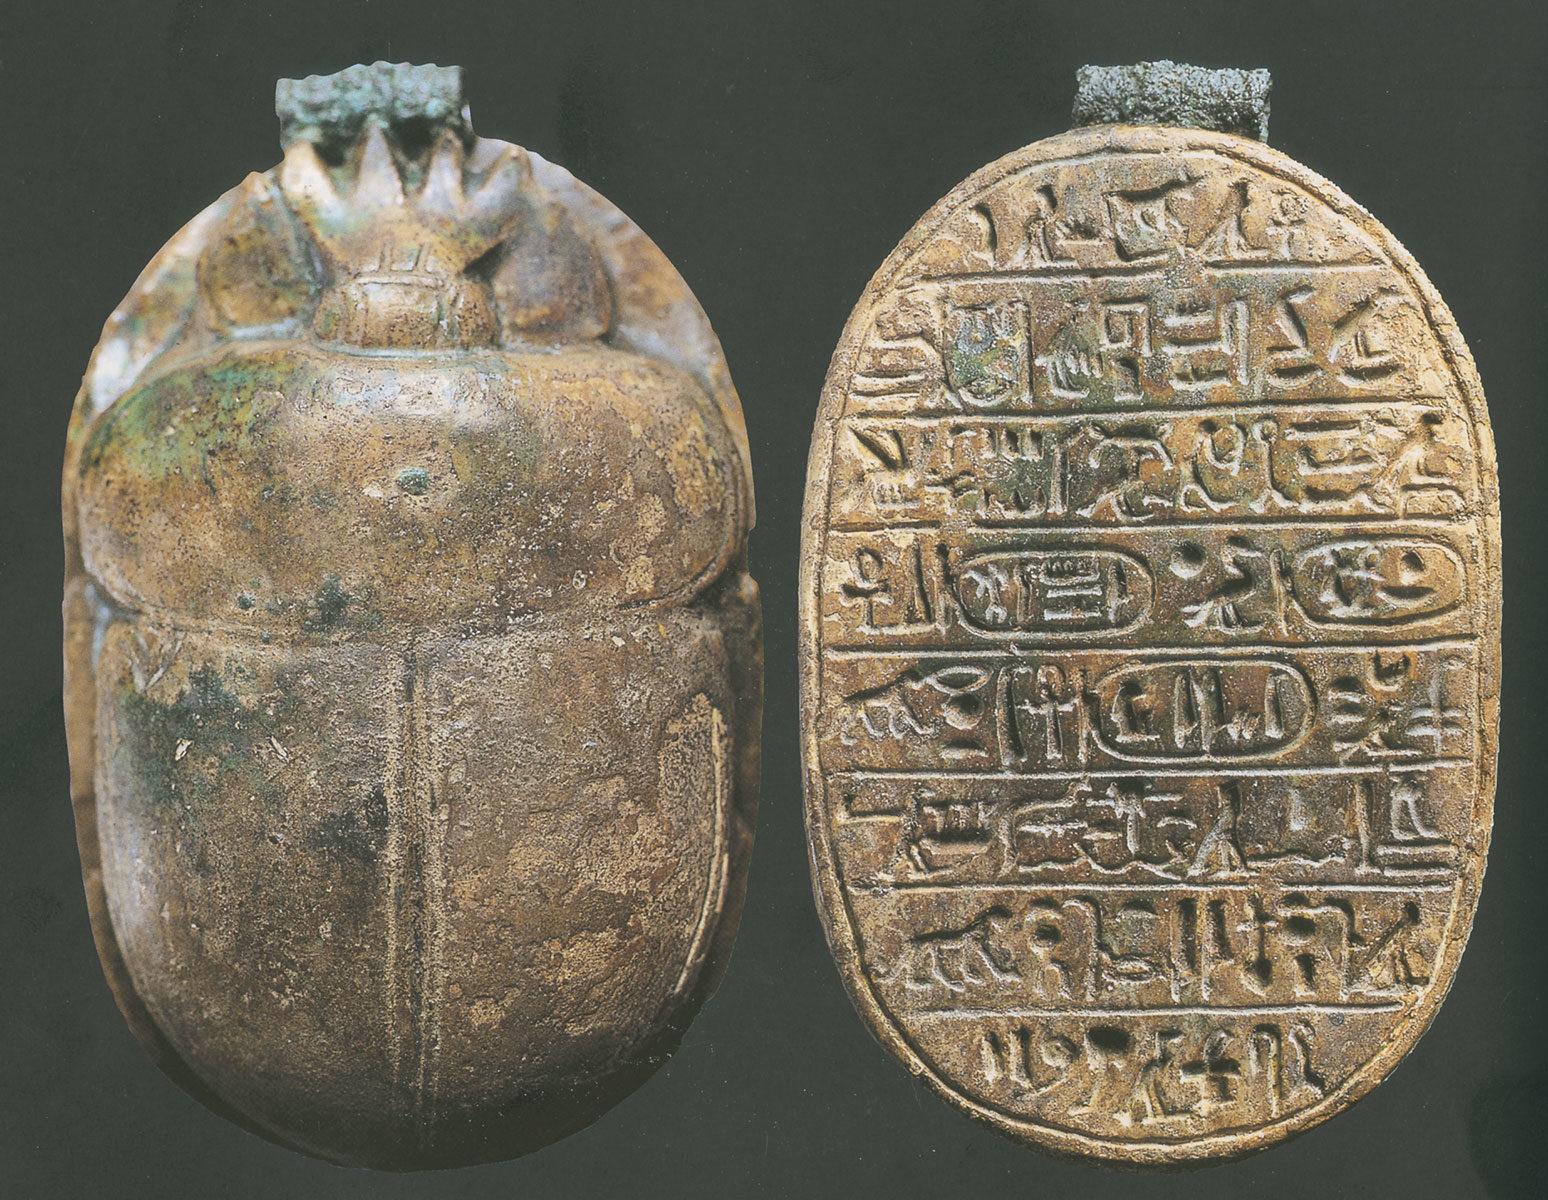 Egyptology Collections of Pisa University